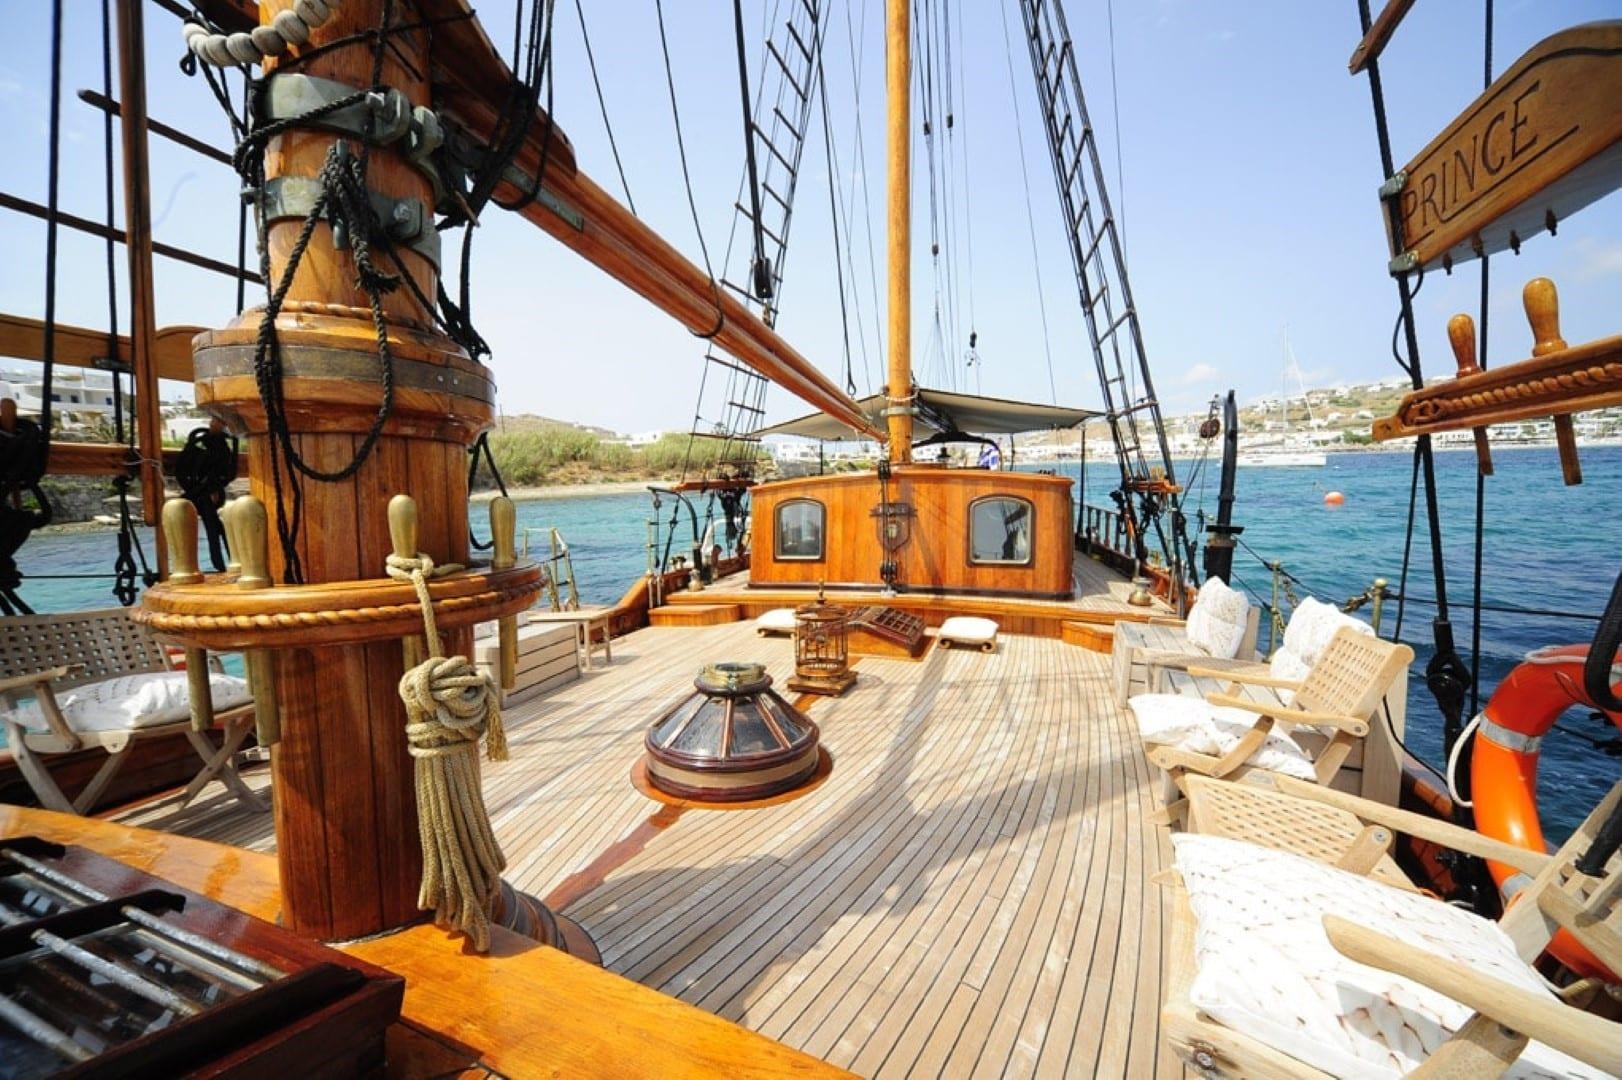 prince motor sailer deck (9) -  Valef Yachts Chartering - 0911